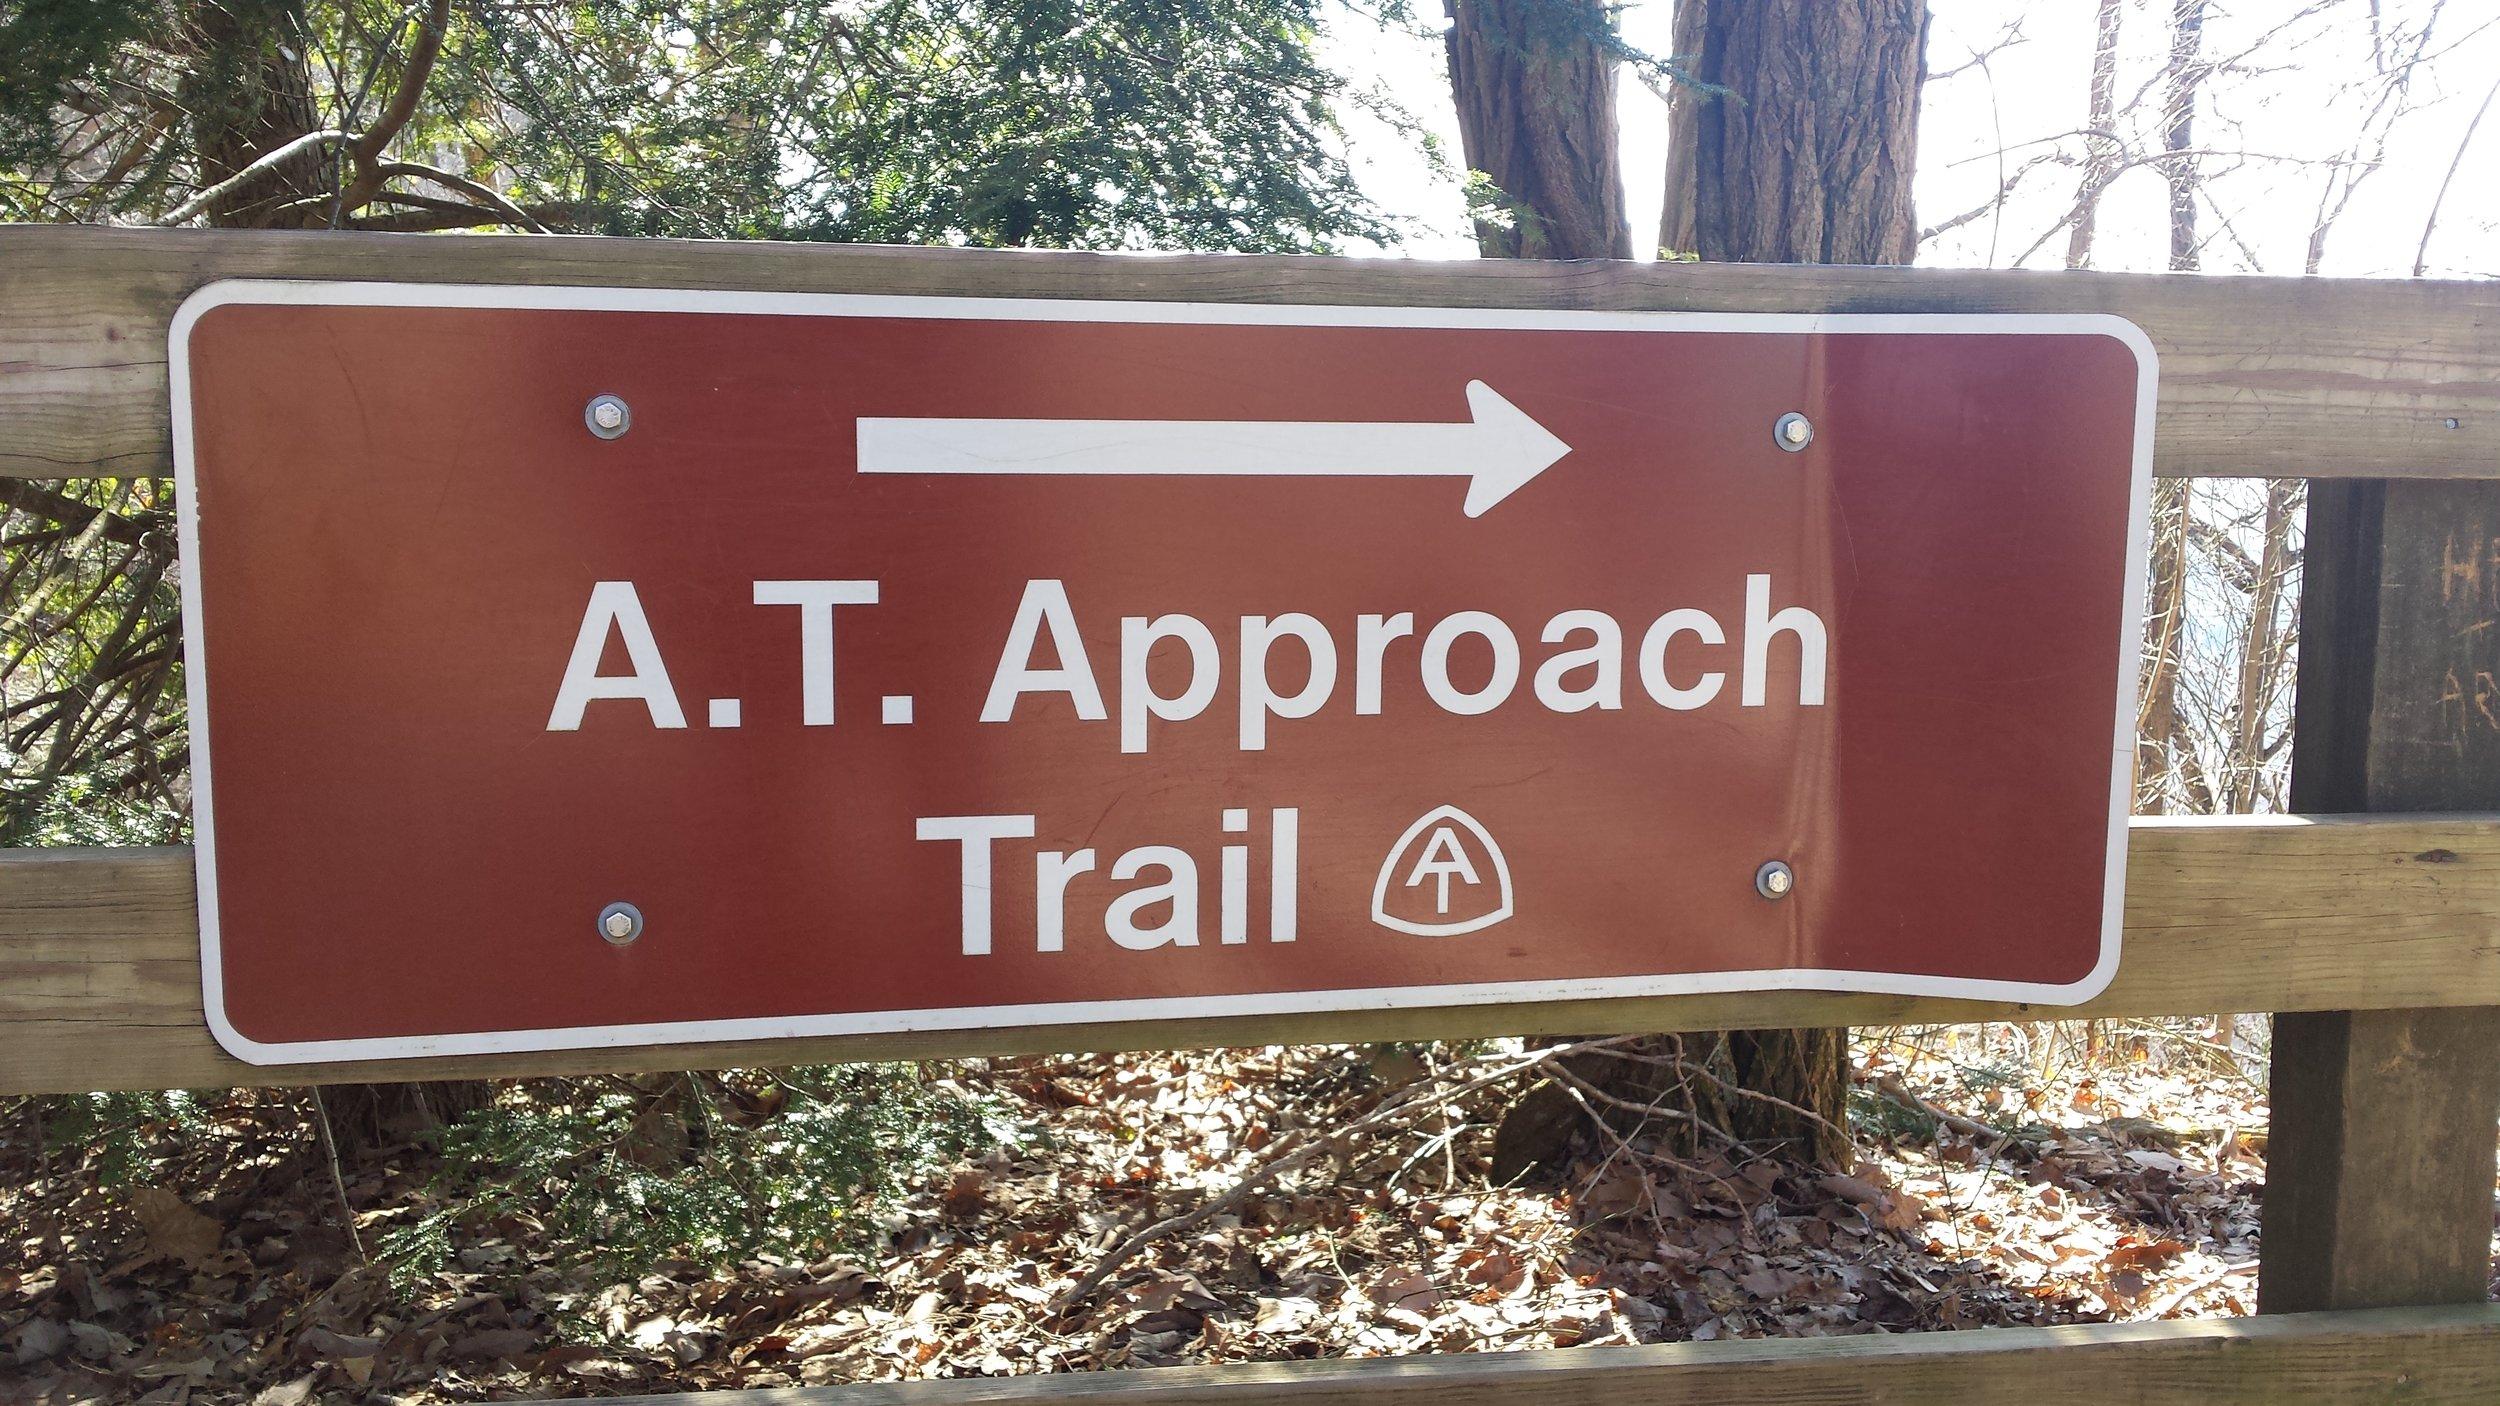 Appalacian Trail access at Amicalola State Park, Georgia